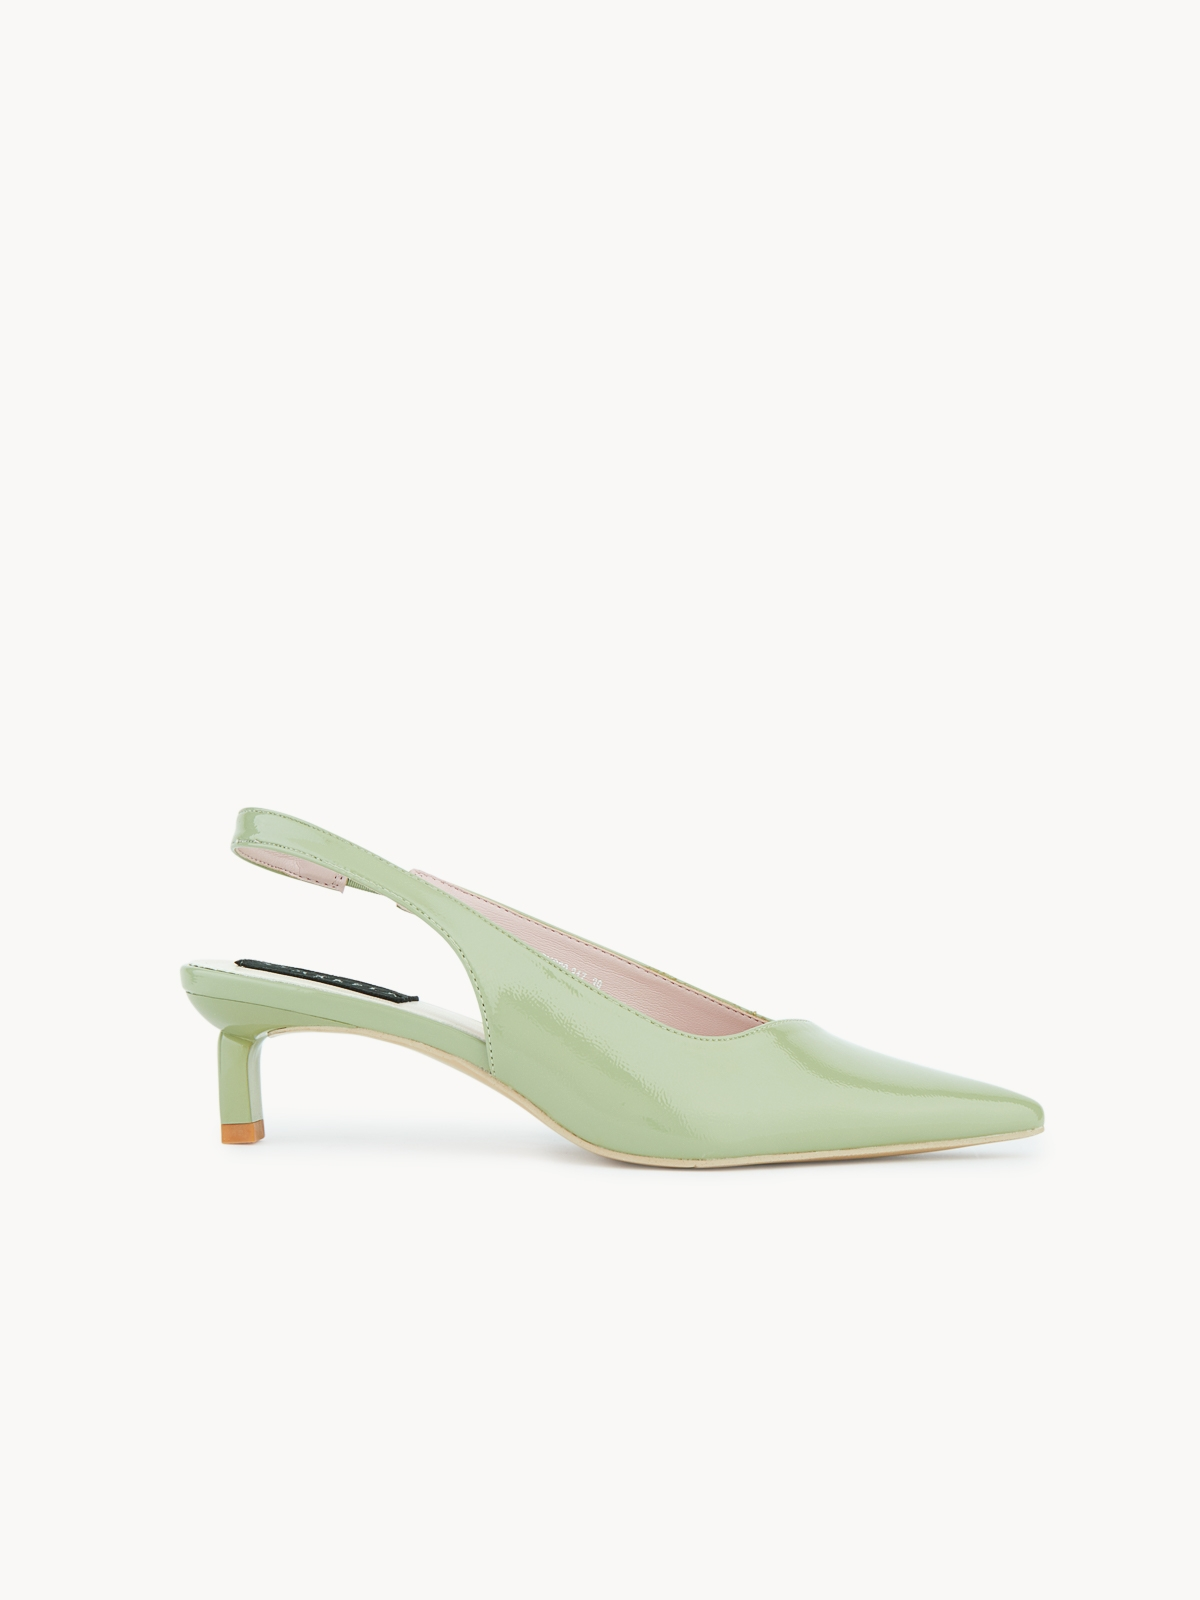 Starkela Slash Cut Slingback Heels Green